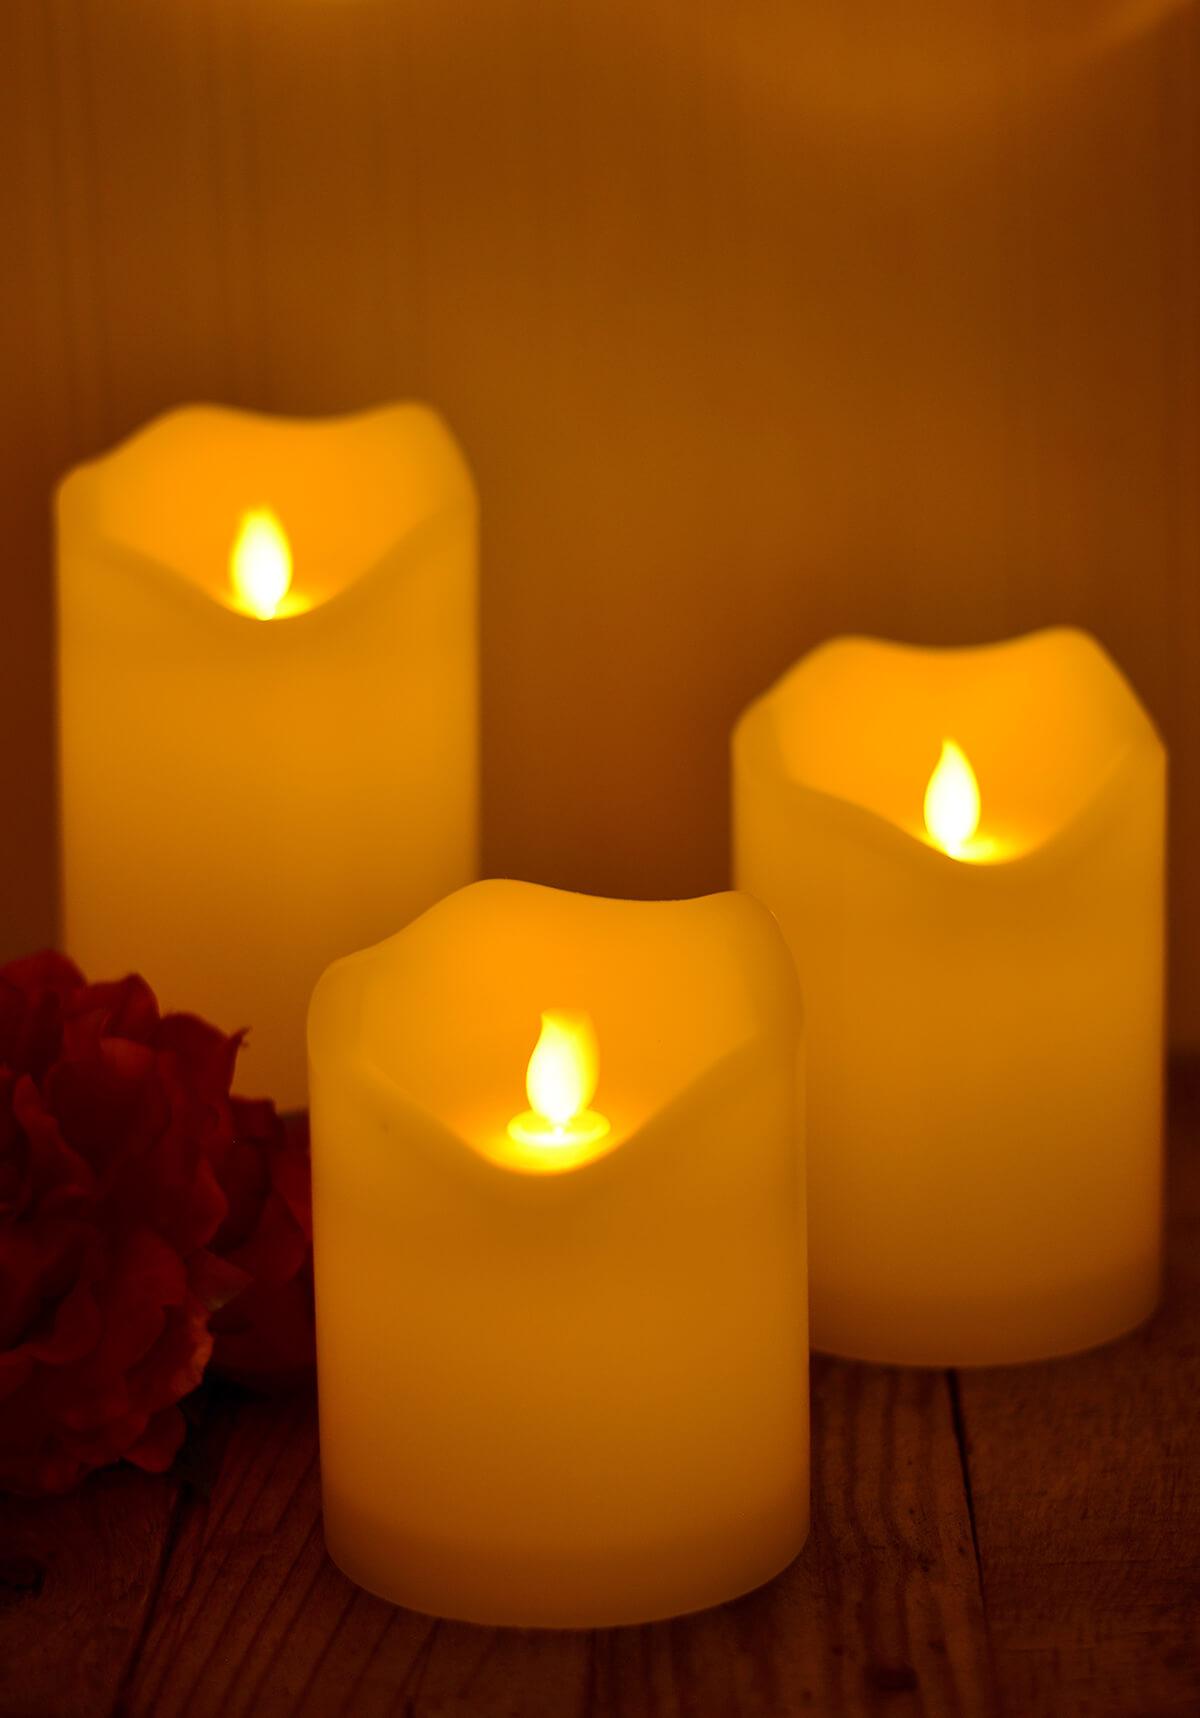 Animated candle flame